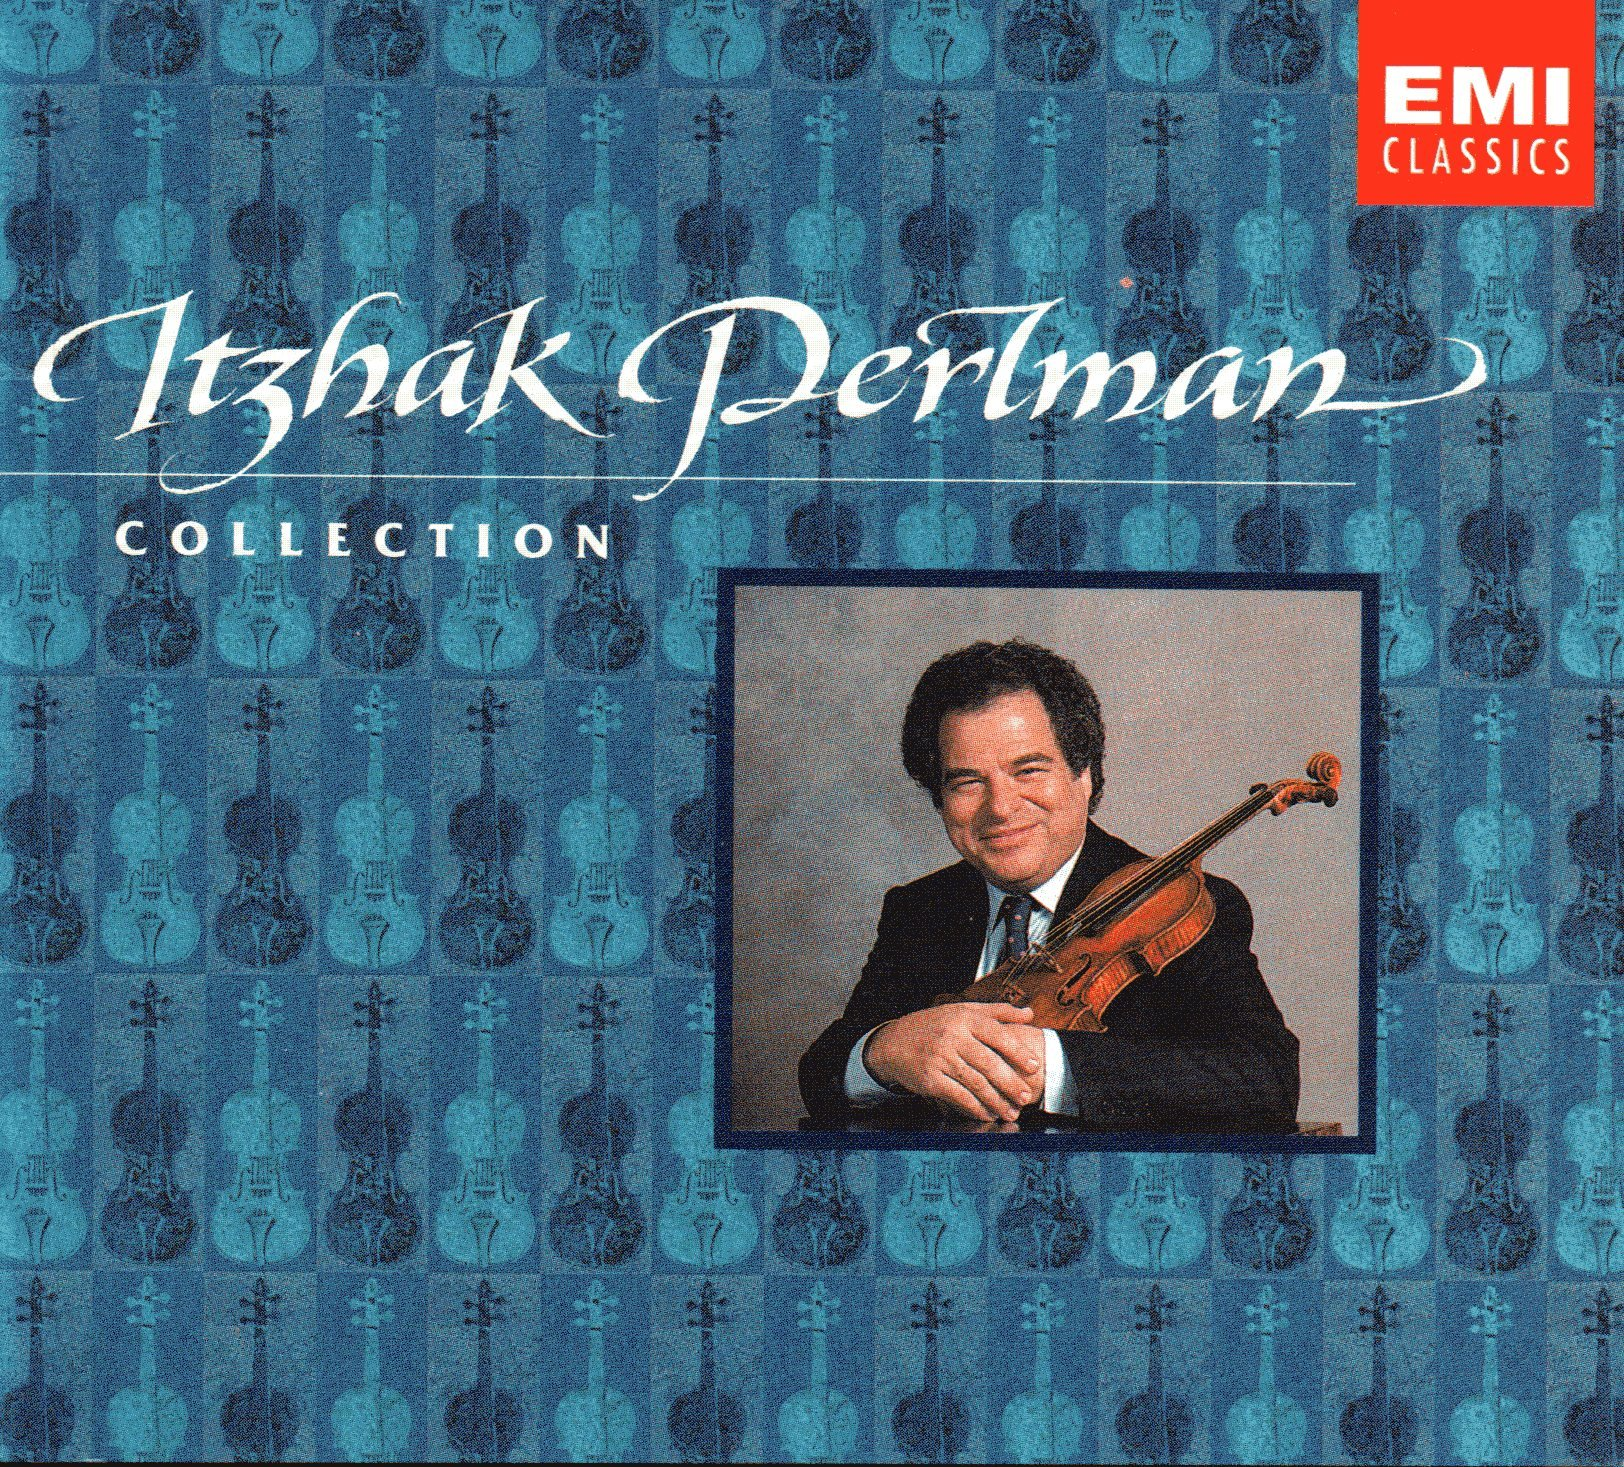 Itzhak Perlman Collection by EMI Distribution